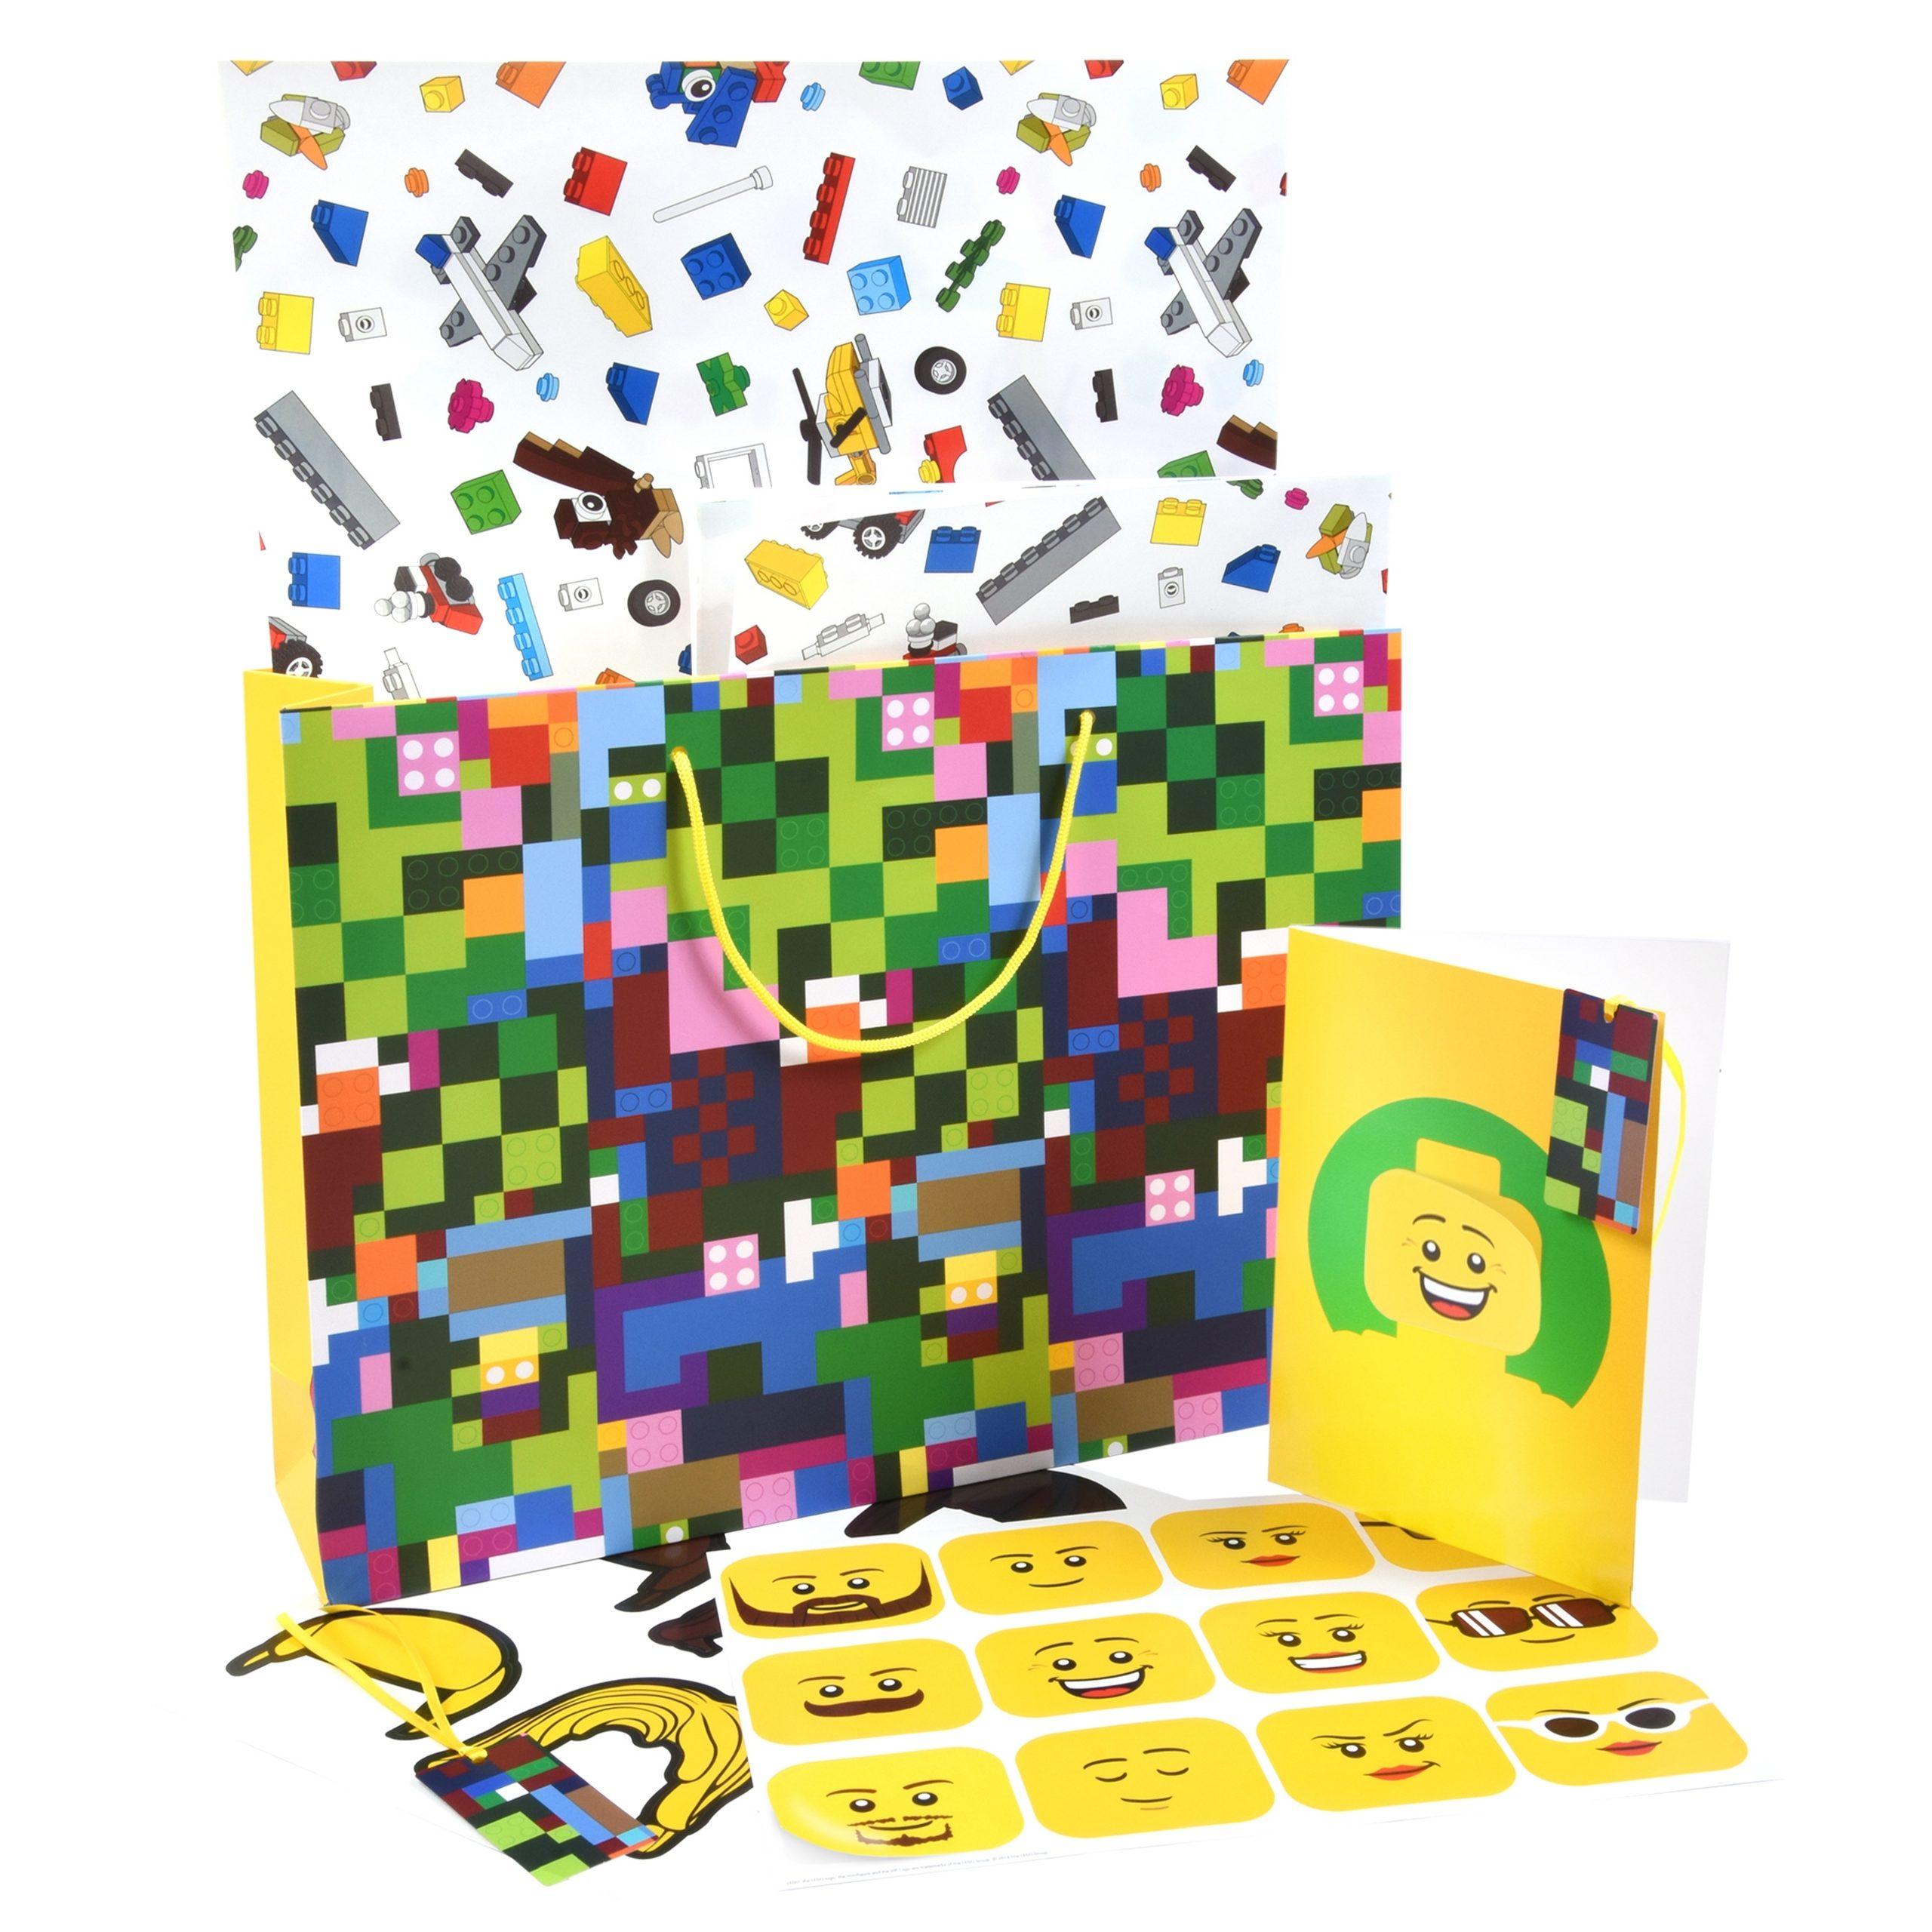 lego 5006008 vip gift set scaled